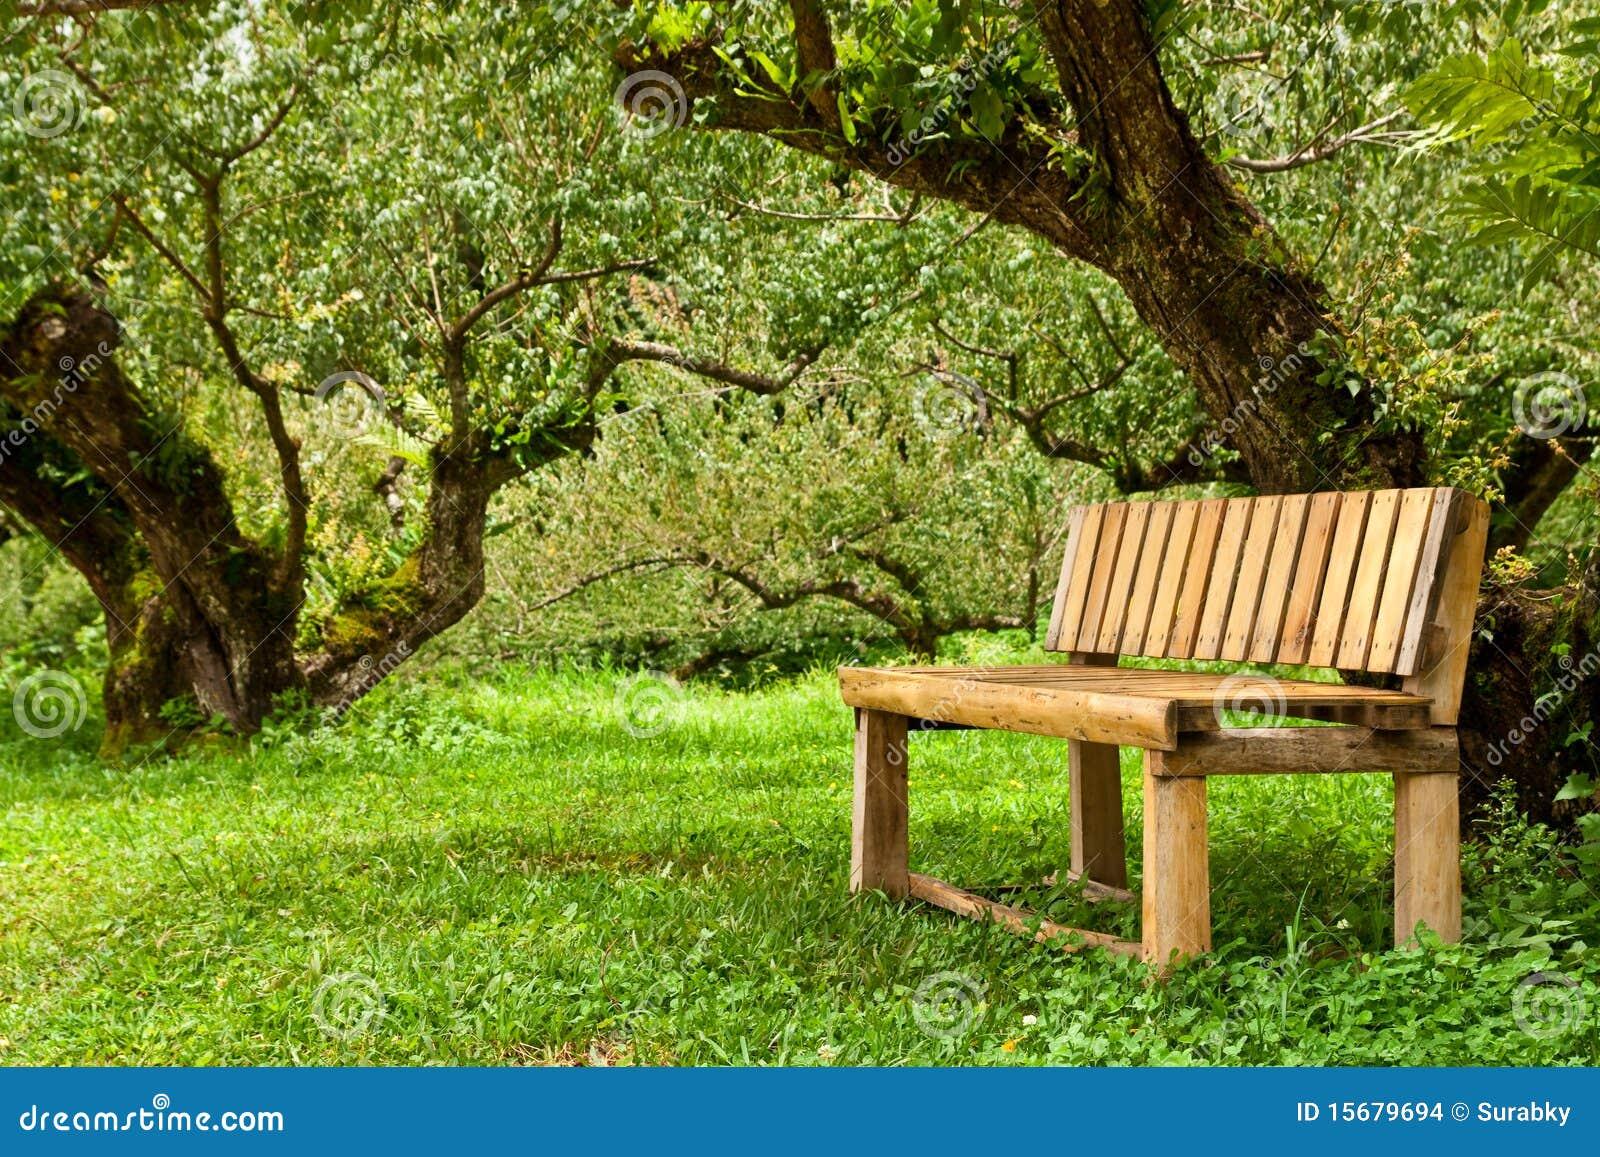 bancos de jardim no rs:Wood Bench